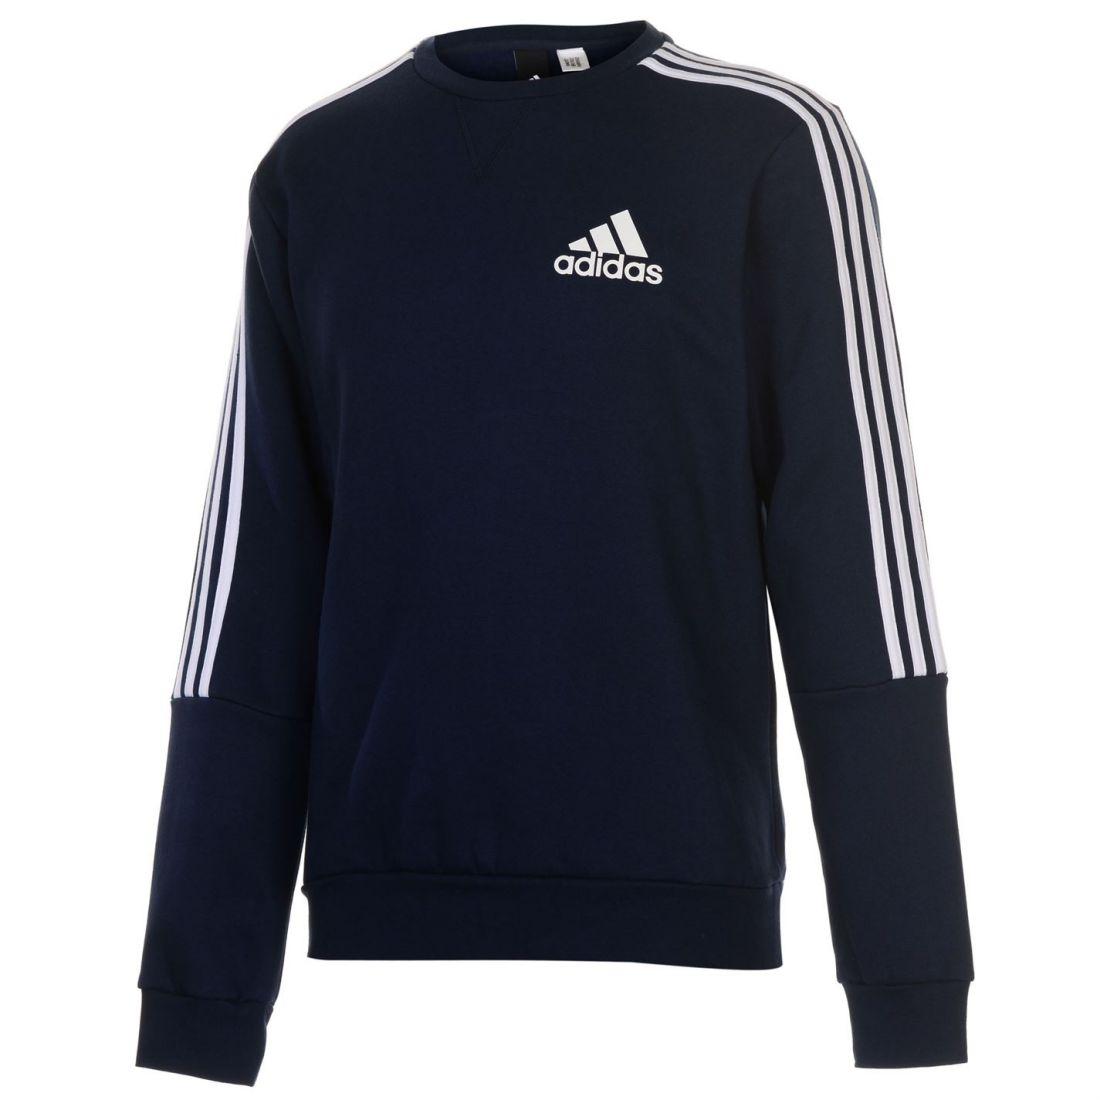 af48d8966ff370 adidas Mens 3 Stripe Sweatshirt Pullover Casual Long Sleeve Crew Neck Top